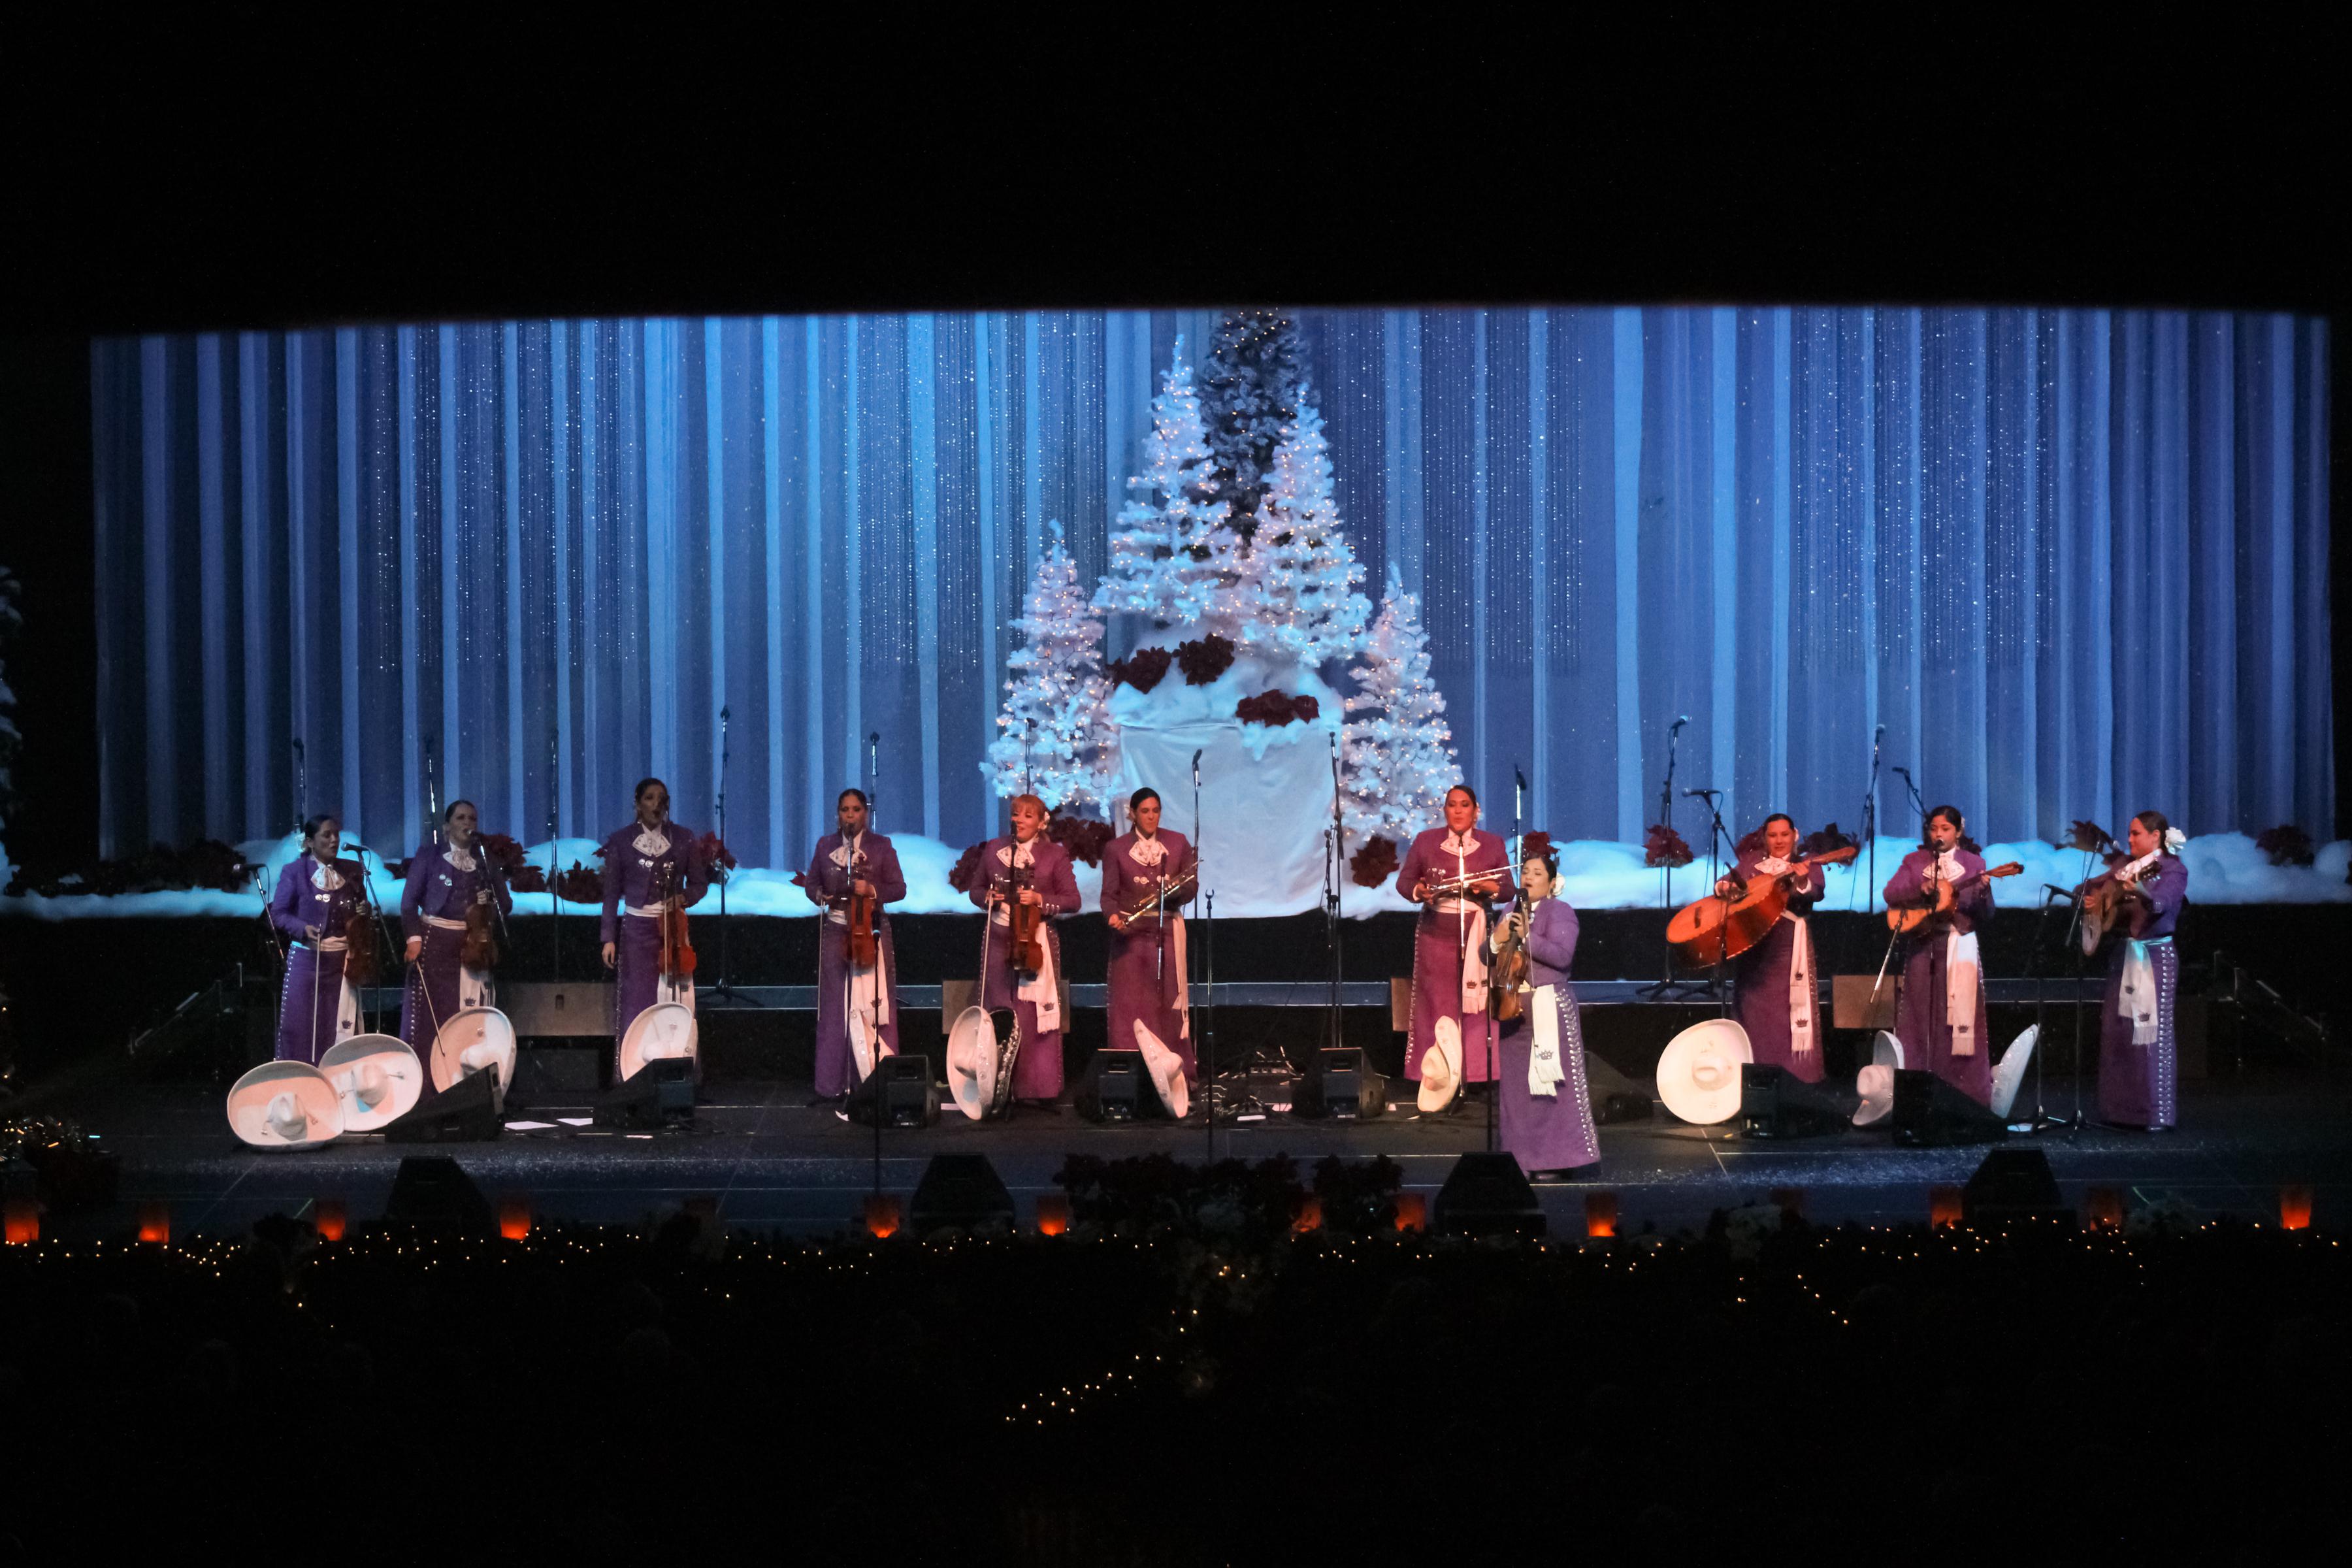 Mariachi Reyna - Navidad Mexicana - Publicity Images